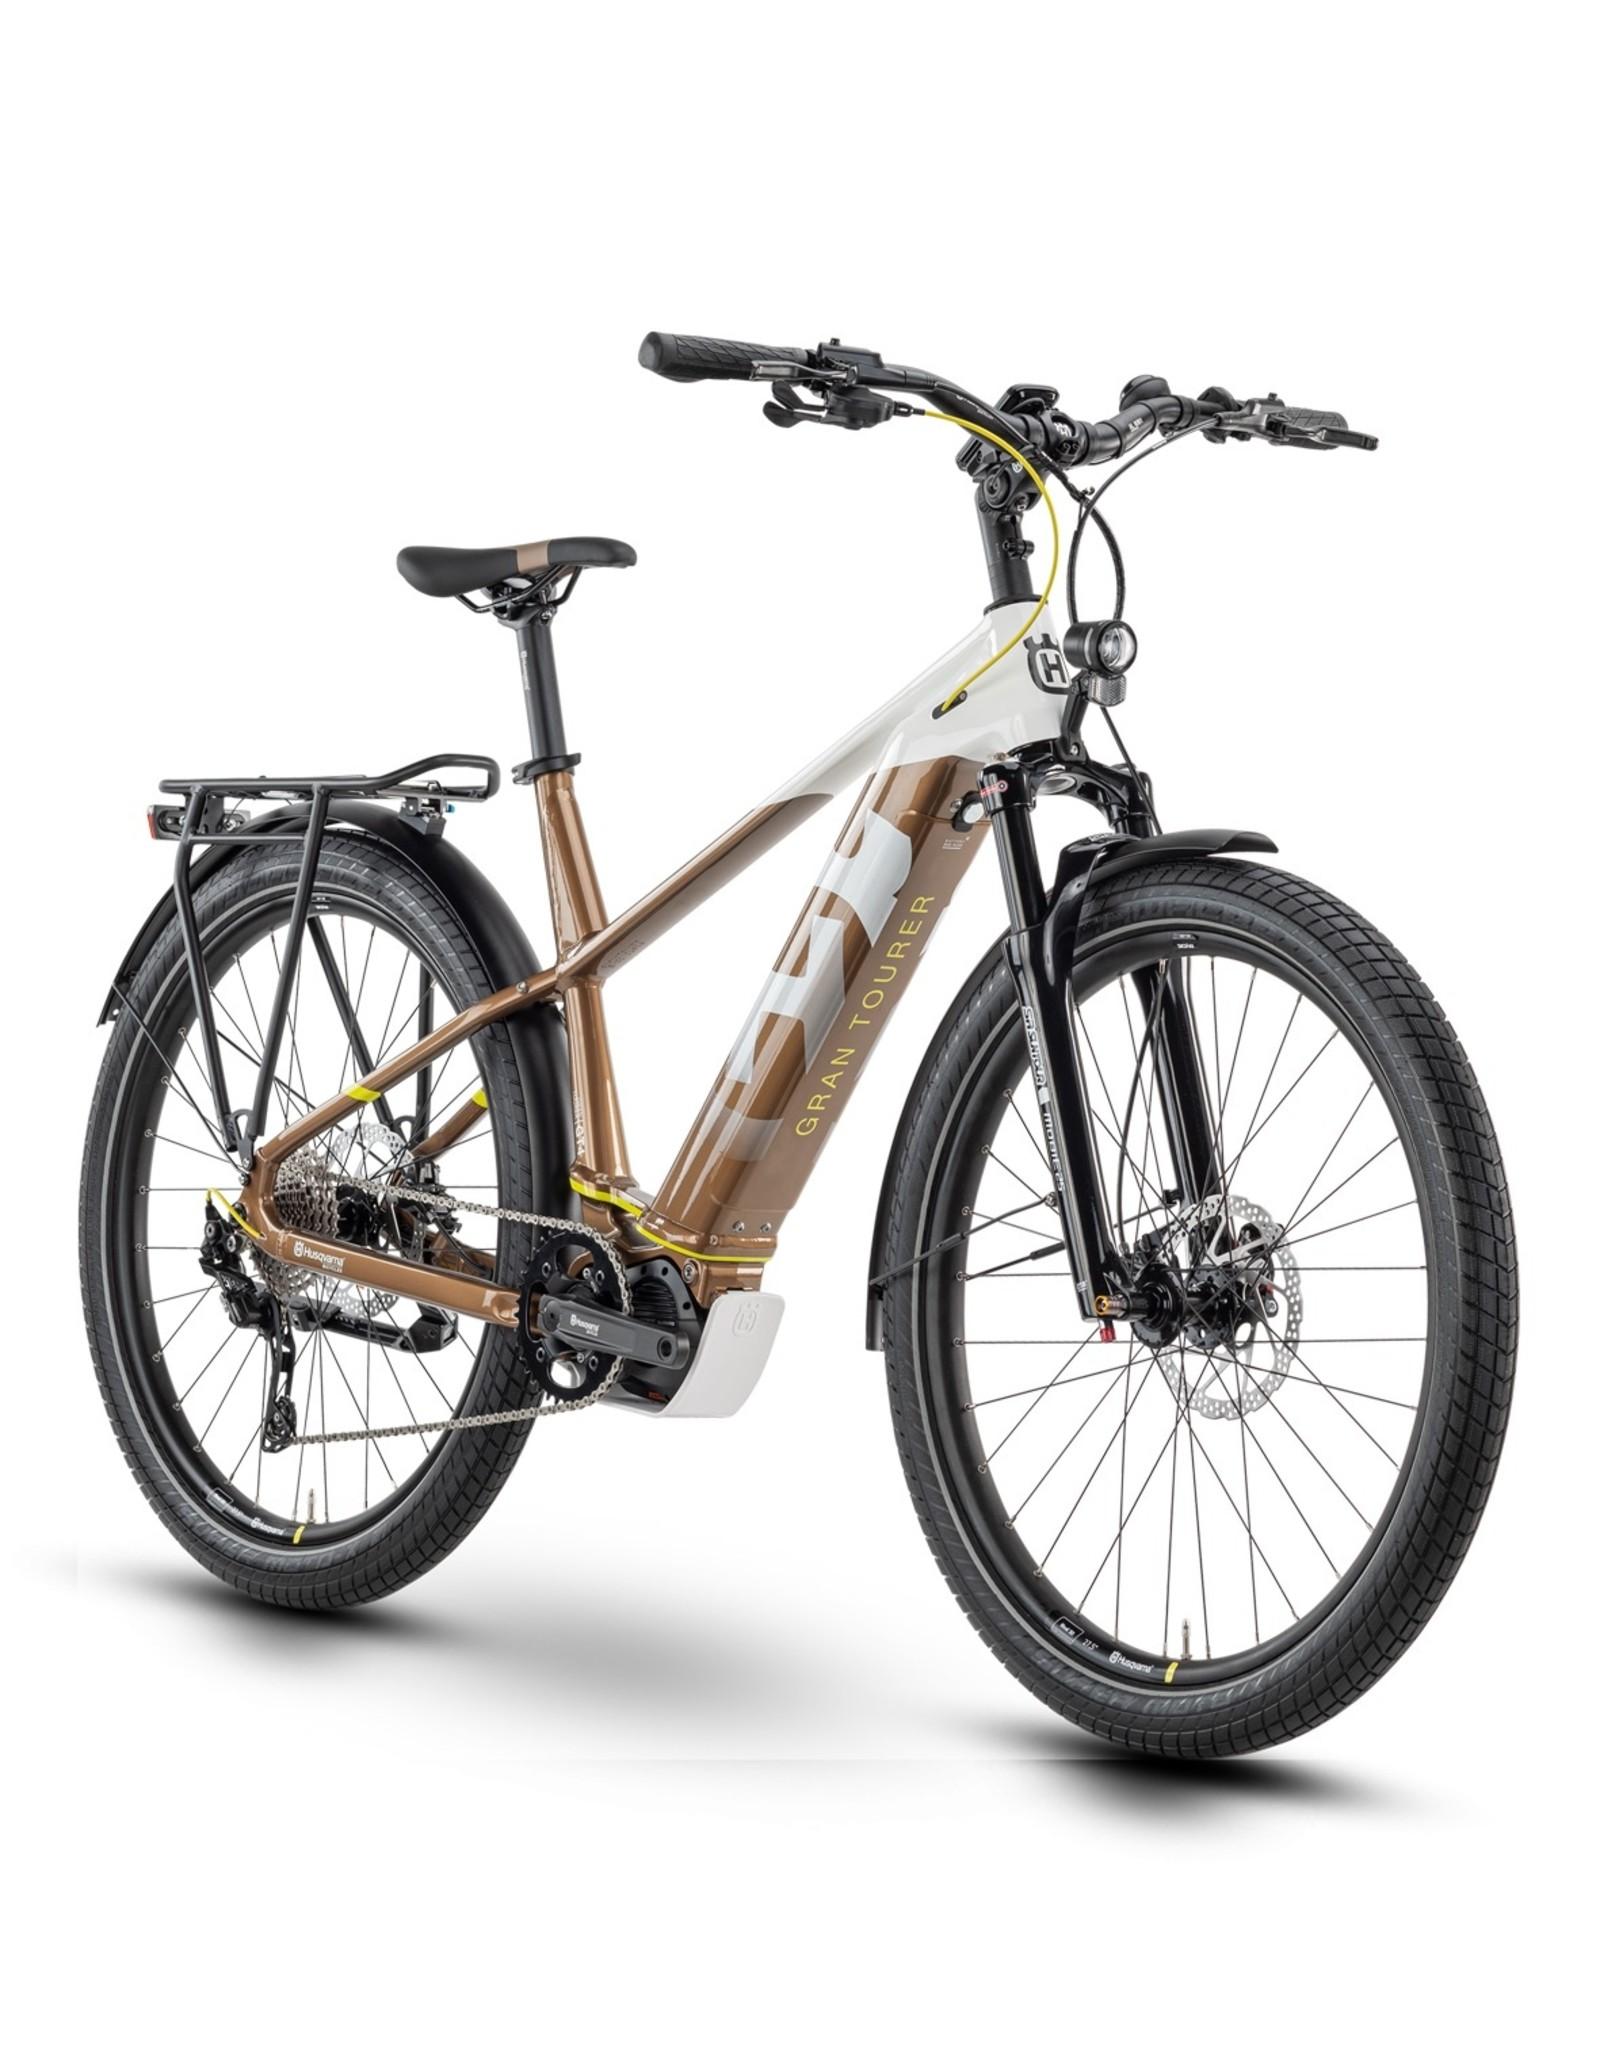 HUSQVARNA Bicycles Husqvarna Bicycles - Gran Tourer GT4 Gent